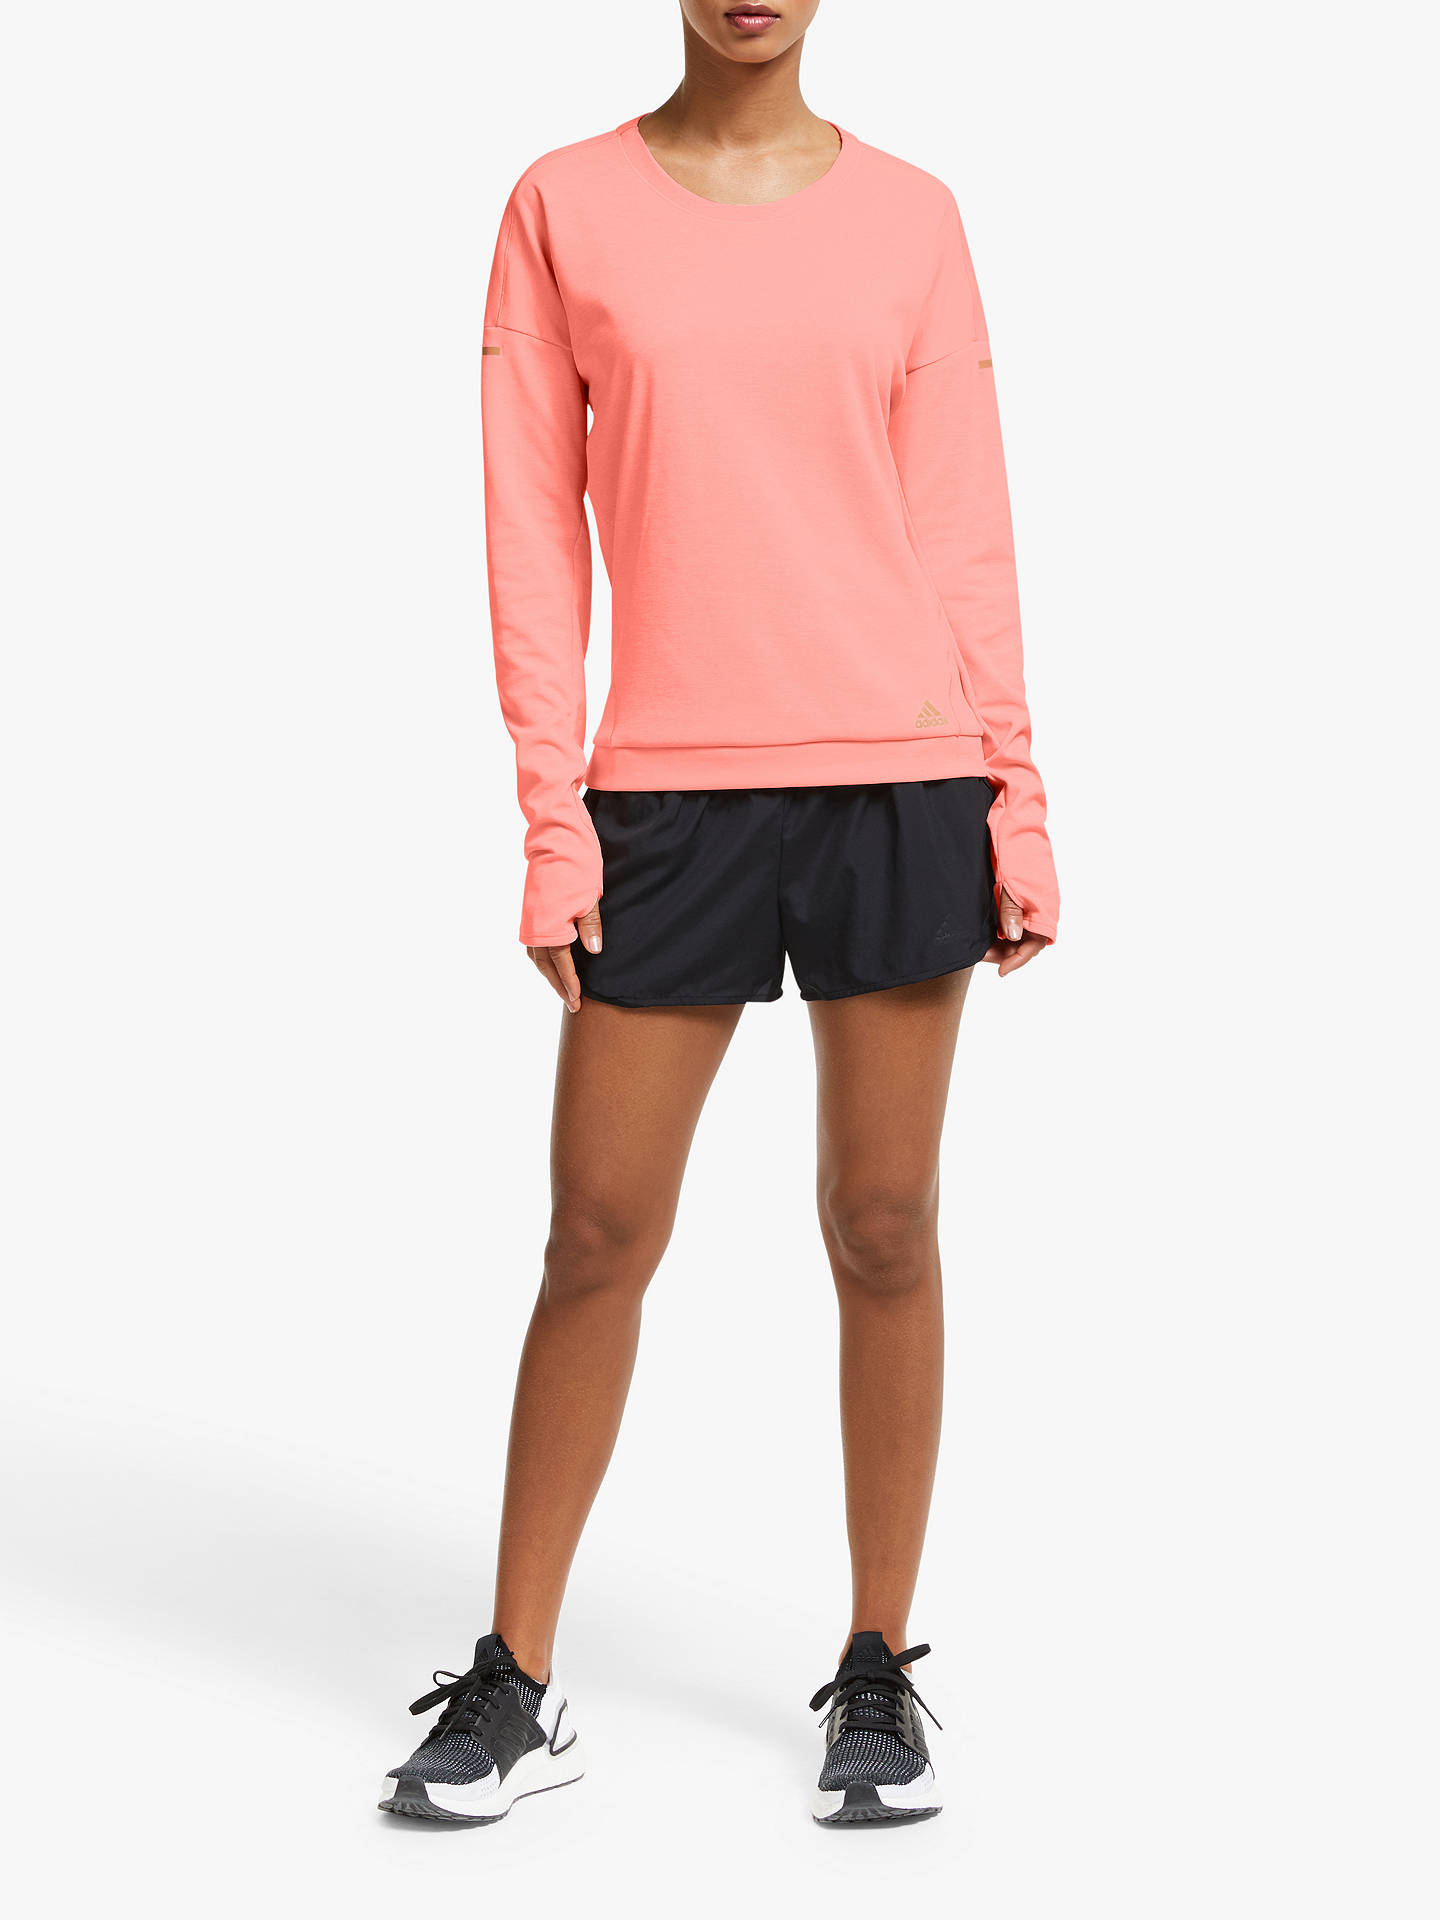 adidas Supernova Run Cru Sweatshirt, Glow PinkHeather